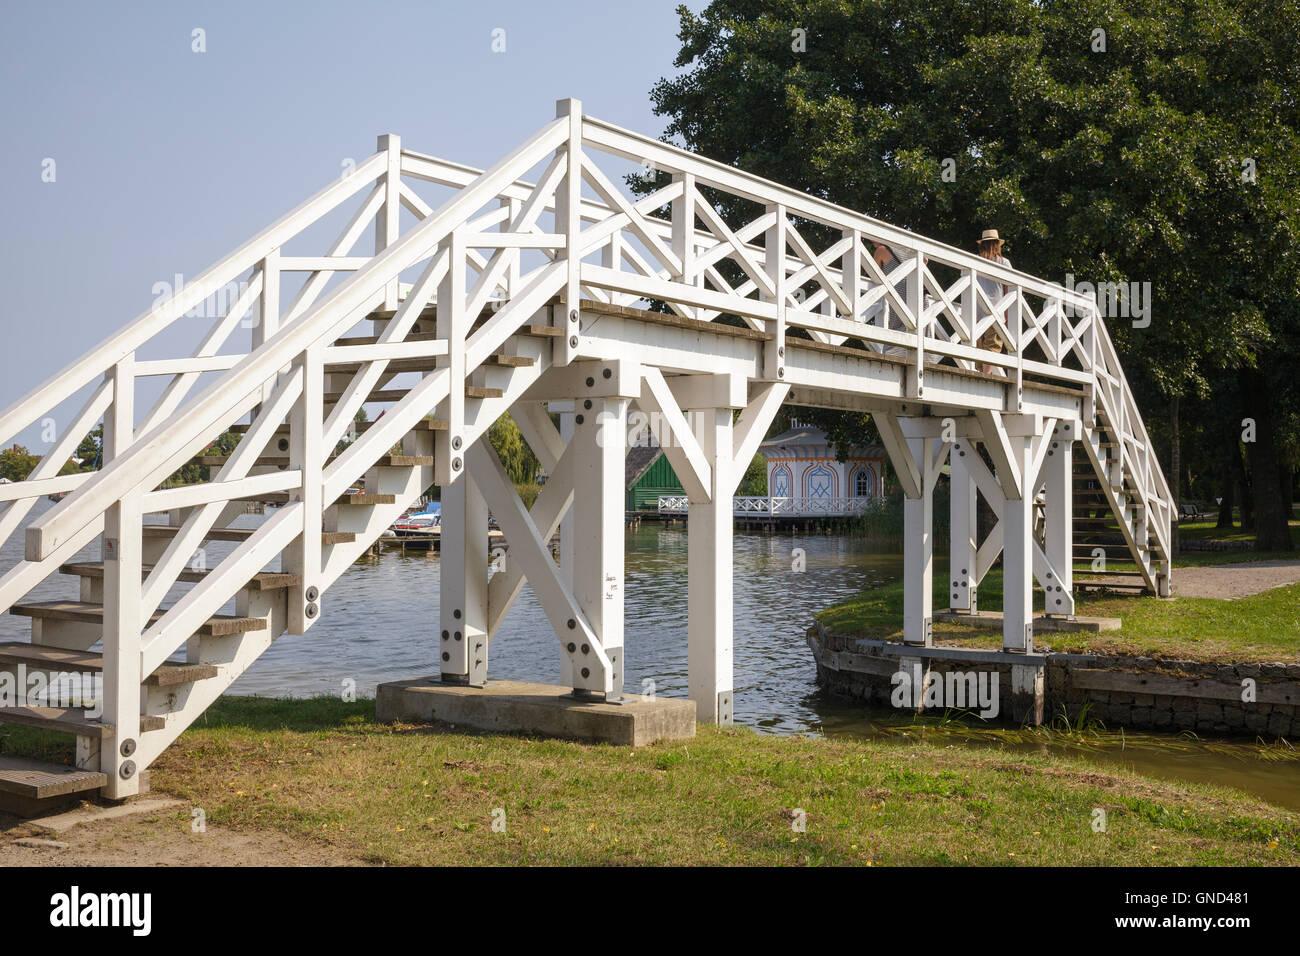 Weisse Bruecke – white bridge, Neustrelitz, Mecklenburg-Vorpommern, Germany - Stock Image